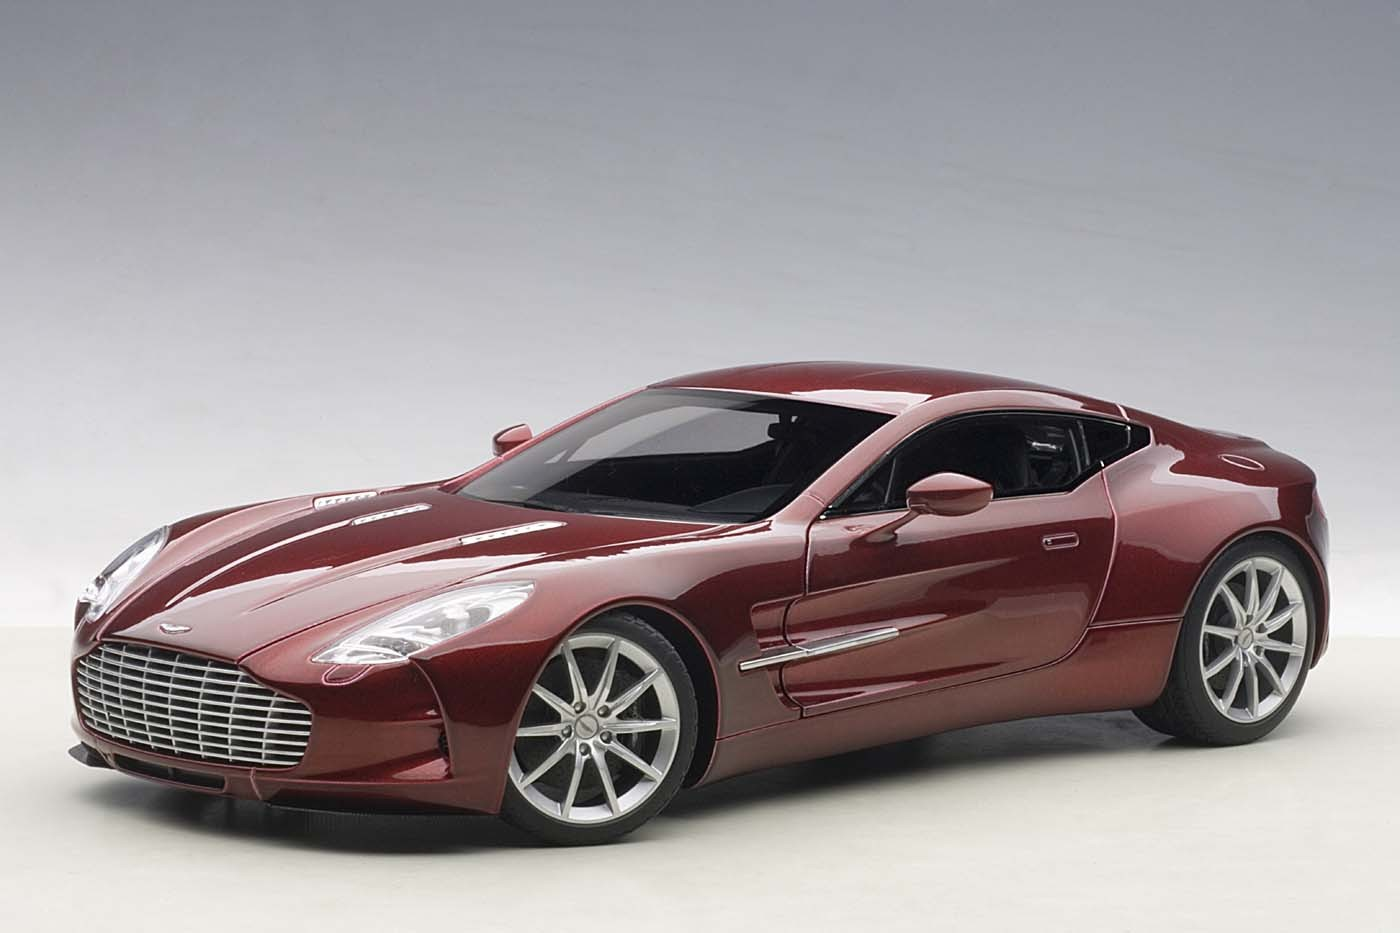 Aston Martin One-77 For Sale >> AUTOart die-cast model Red Aston Martin One-77 Diavolo ...